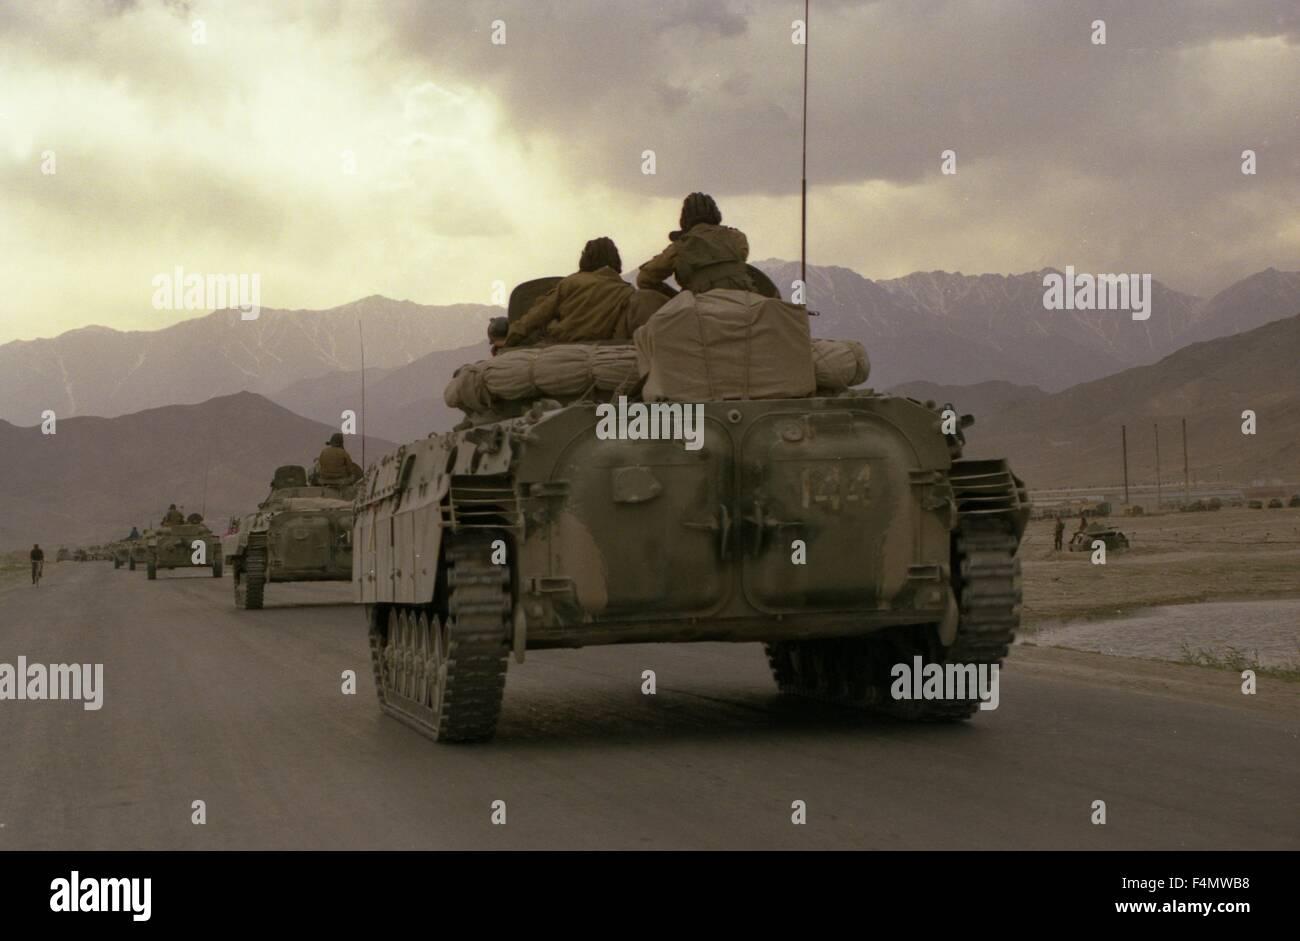 Soviet Afghanistan war - Page 6 Afghanistan-the-soviet-military-technics-on-road-to-kandahar-F4MWB8